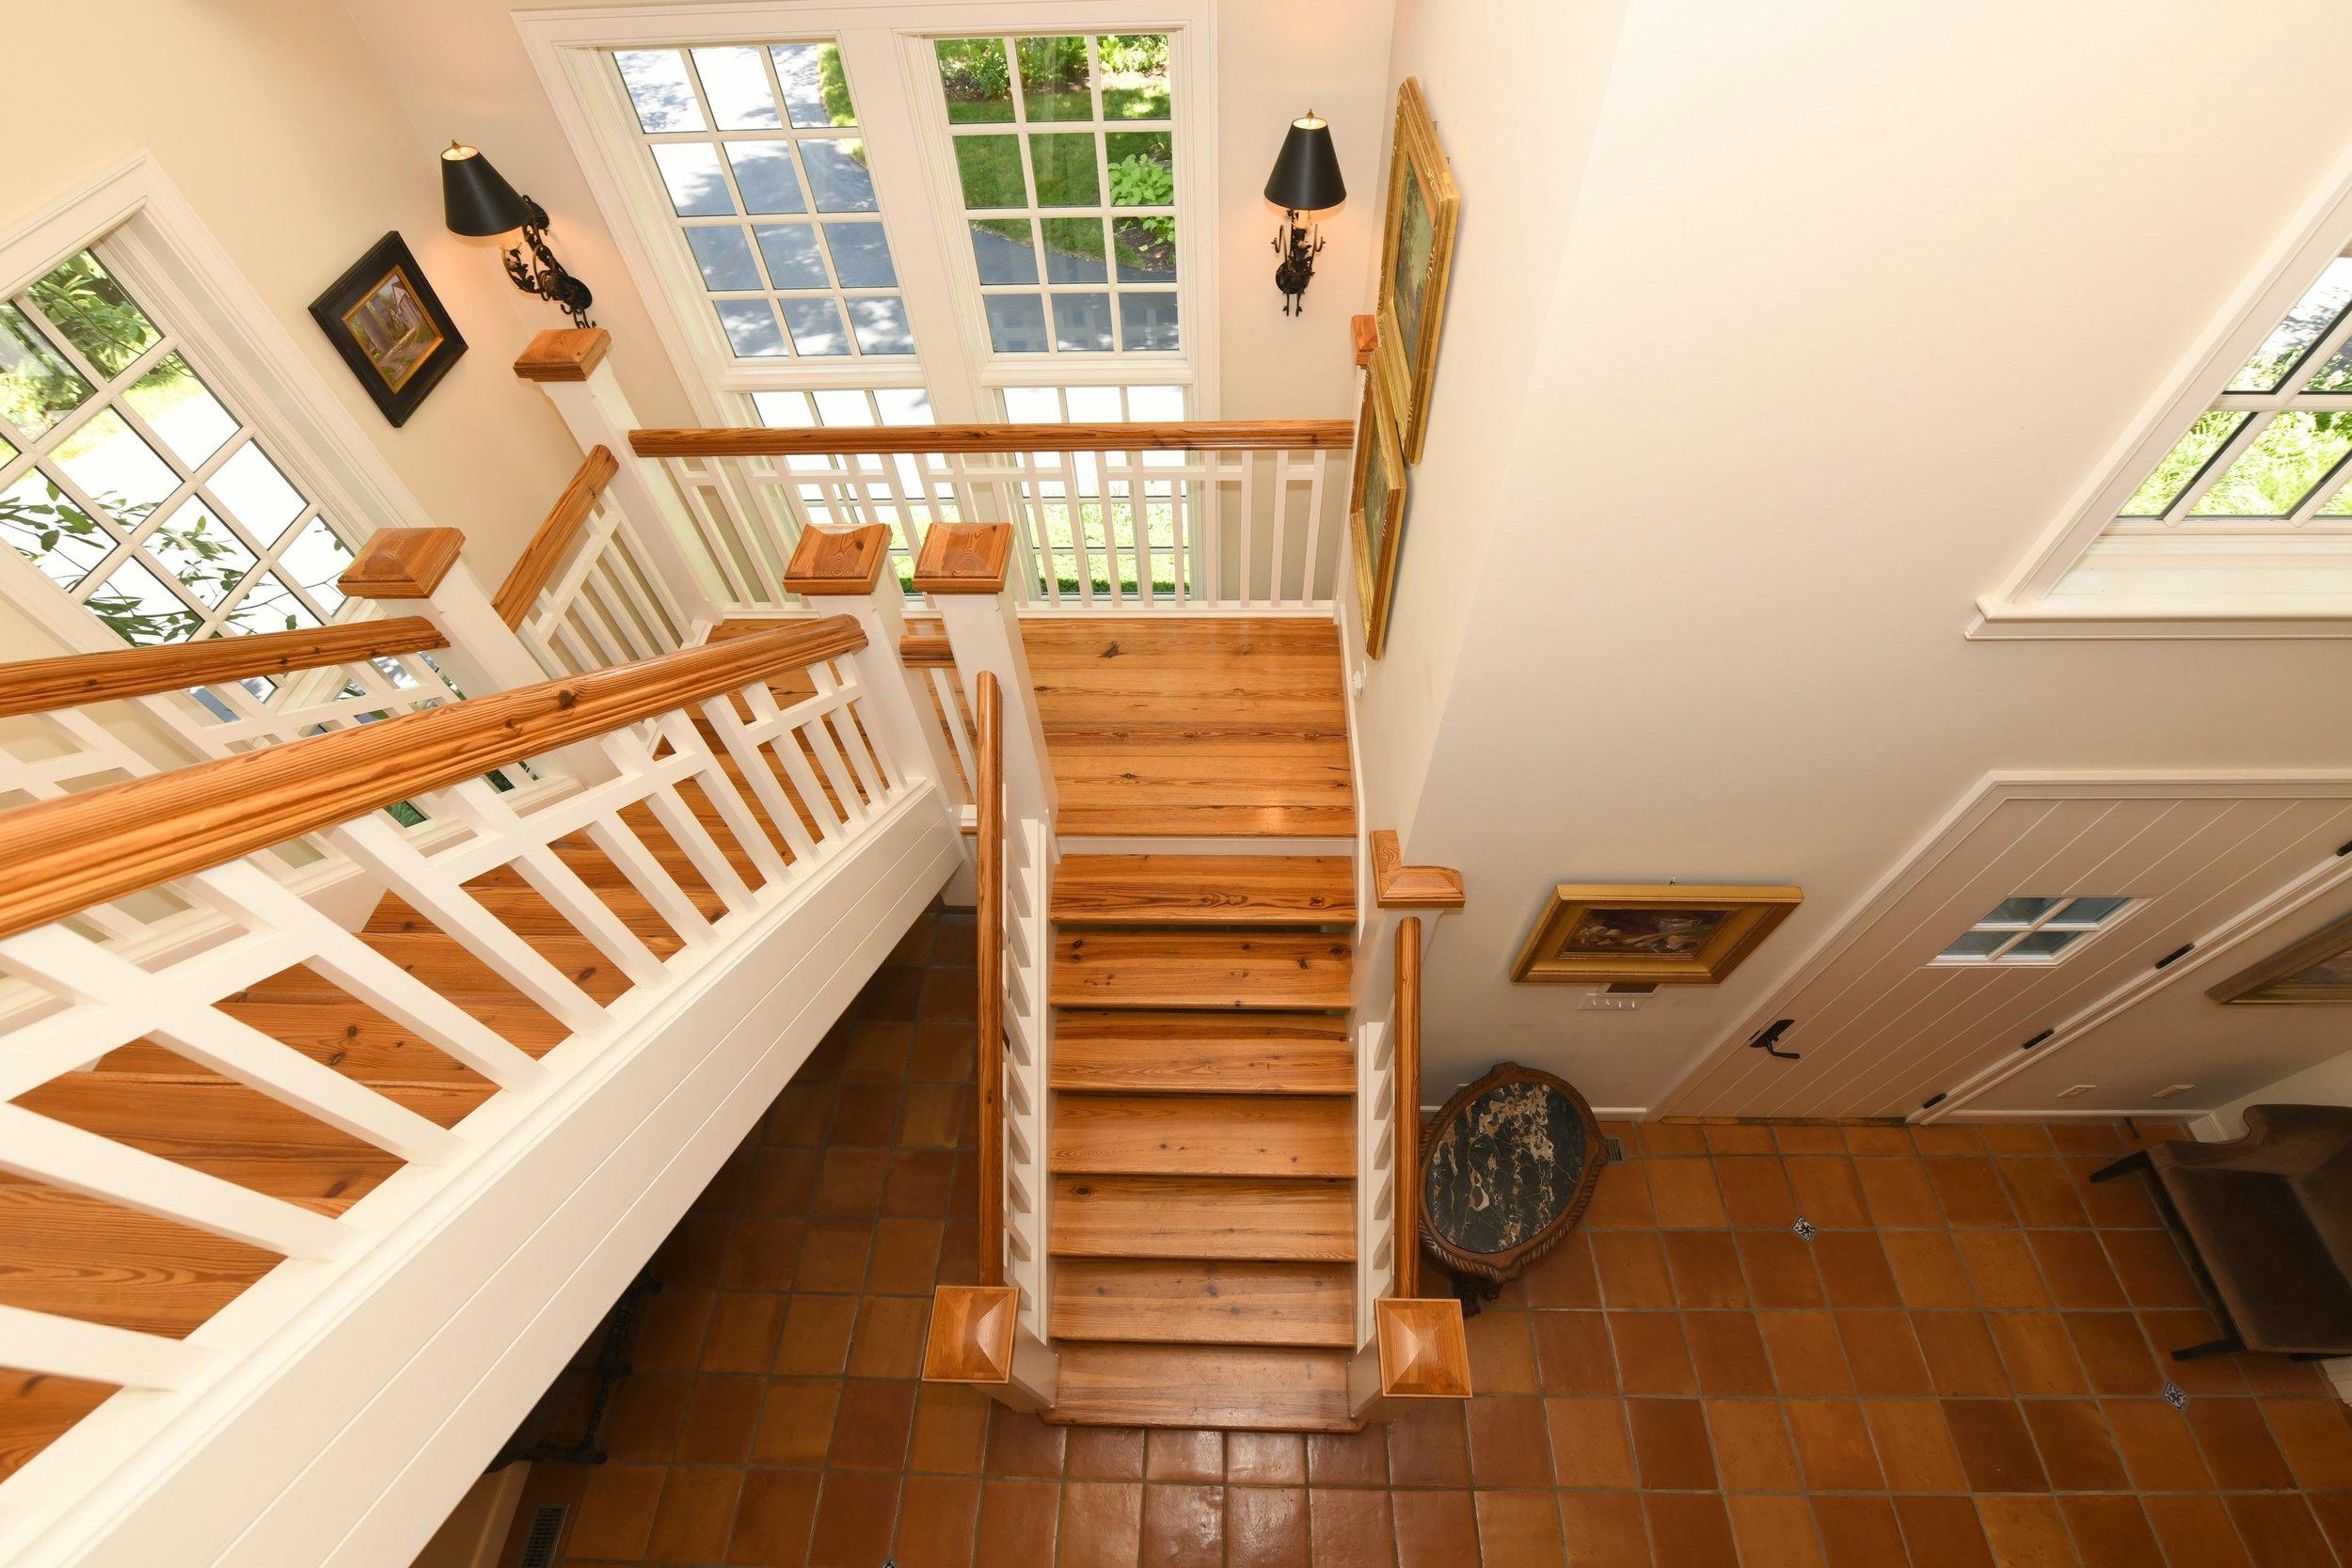 026_Staircase.jpg